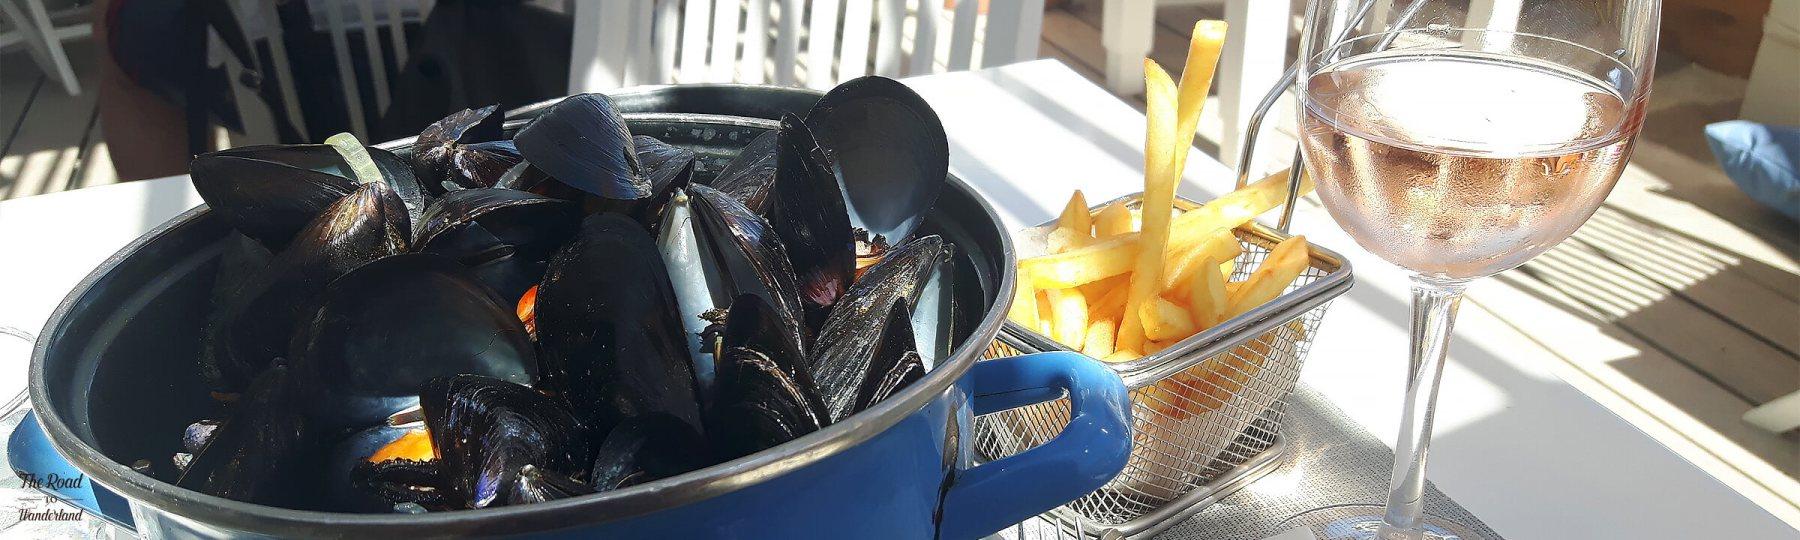 Moules frites at La Ola